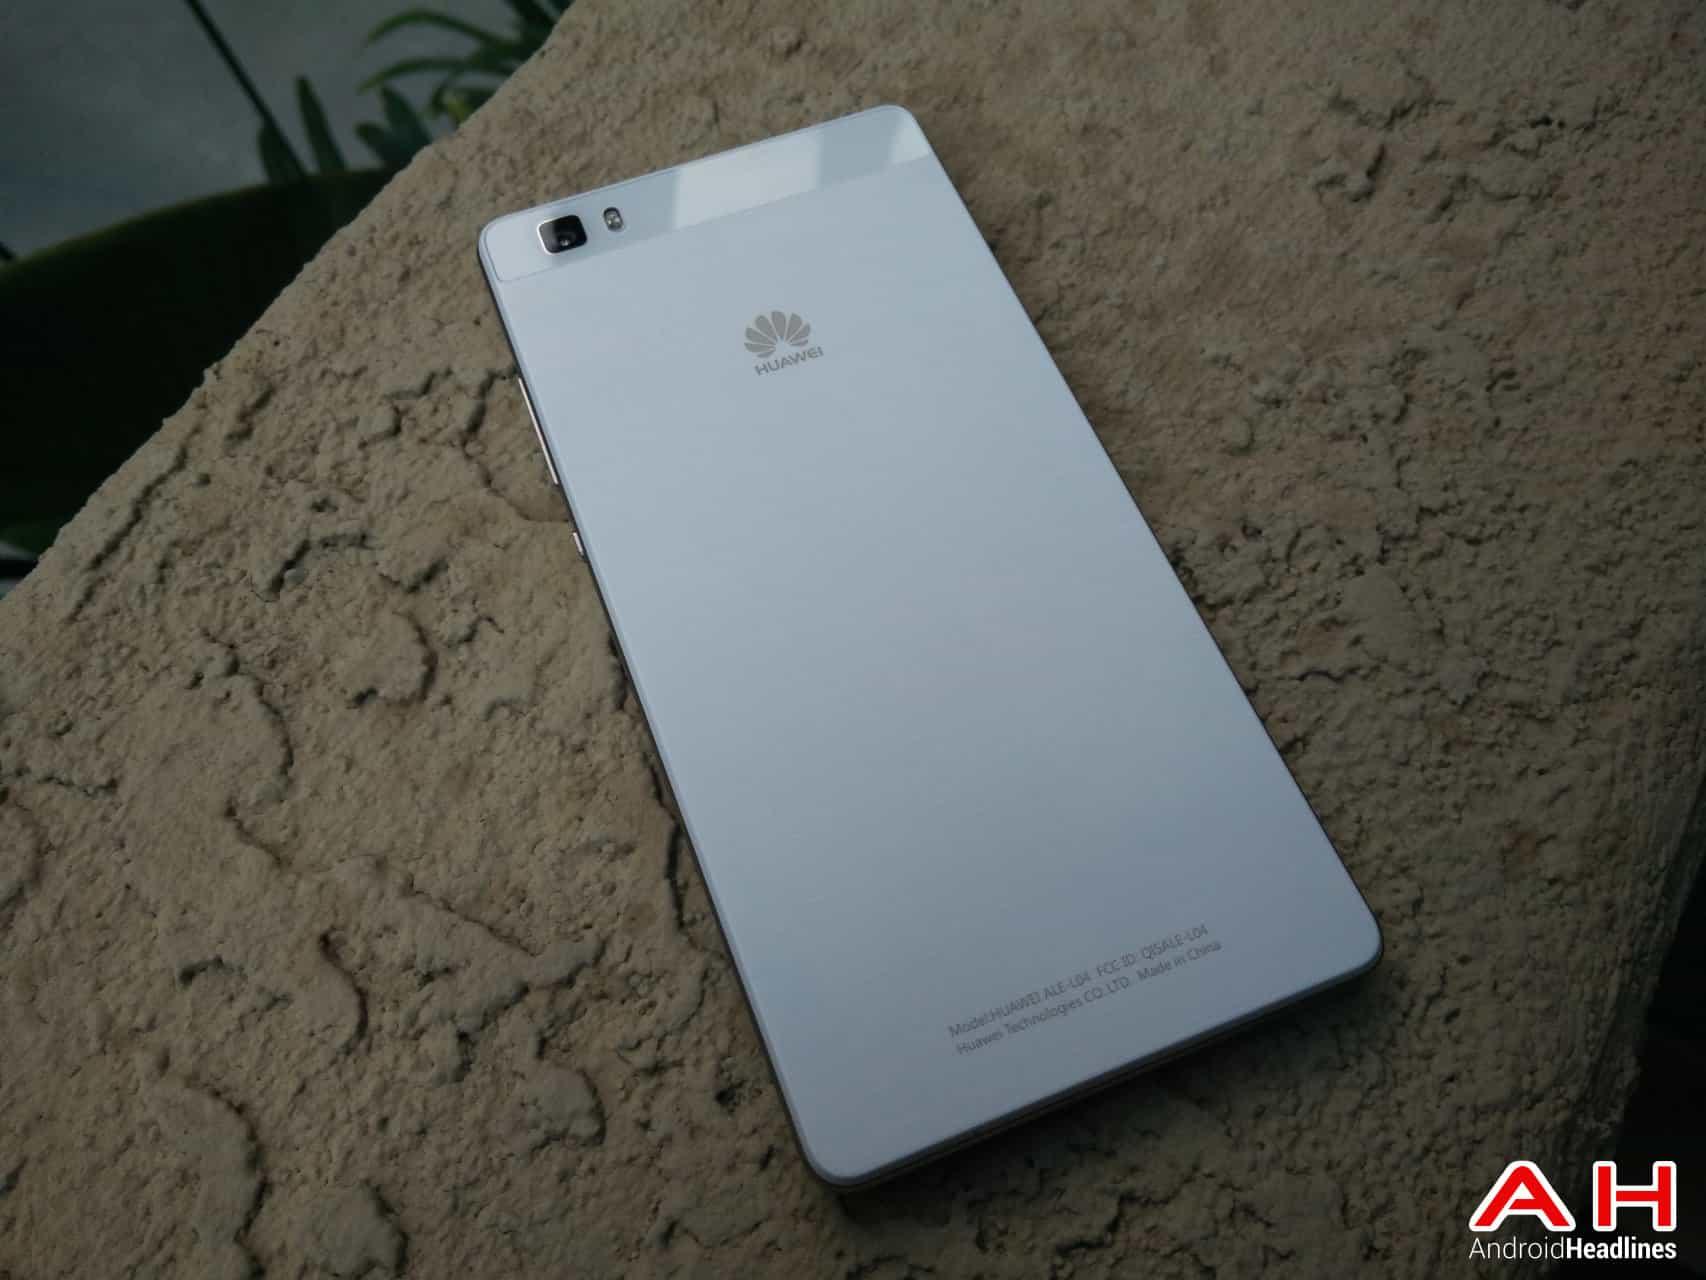 Huawei P8 Lite AH 01-20